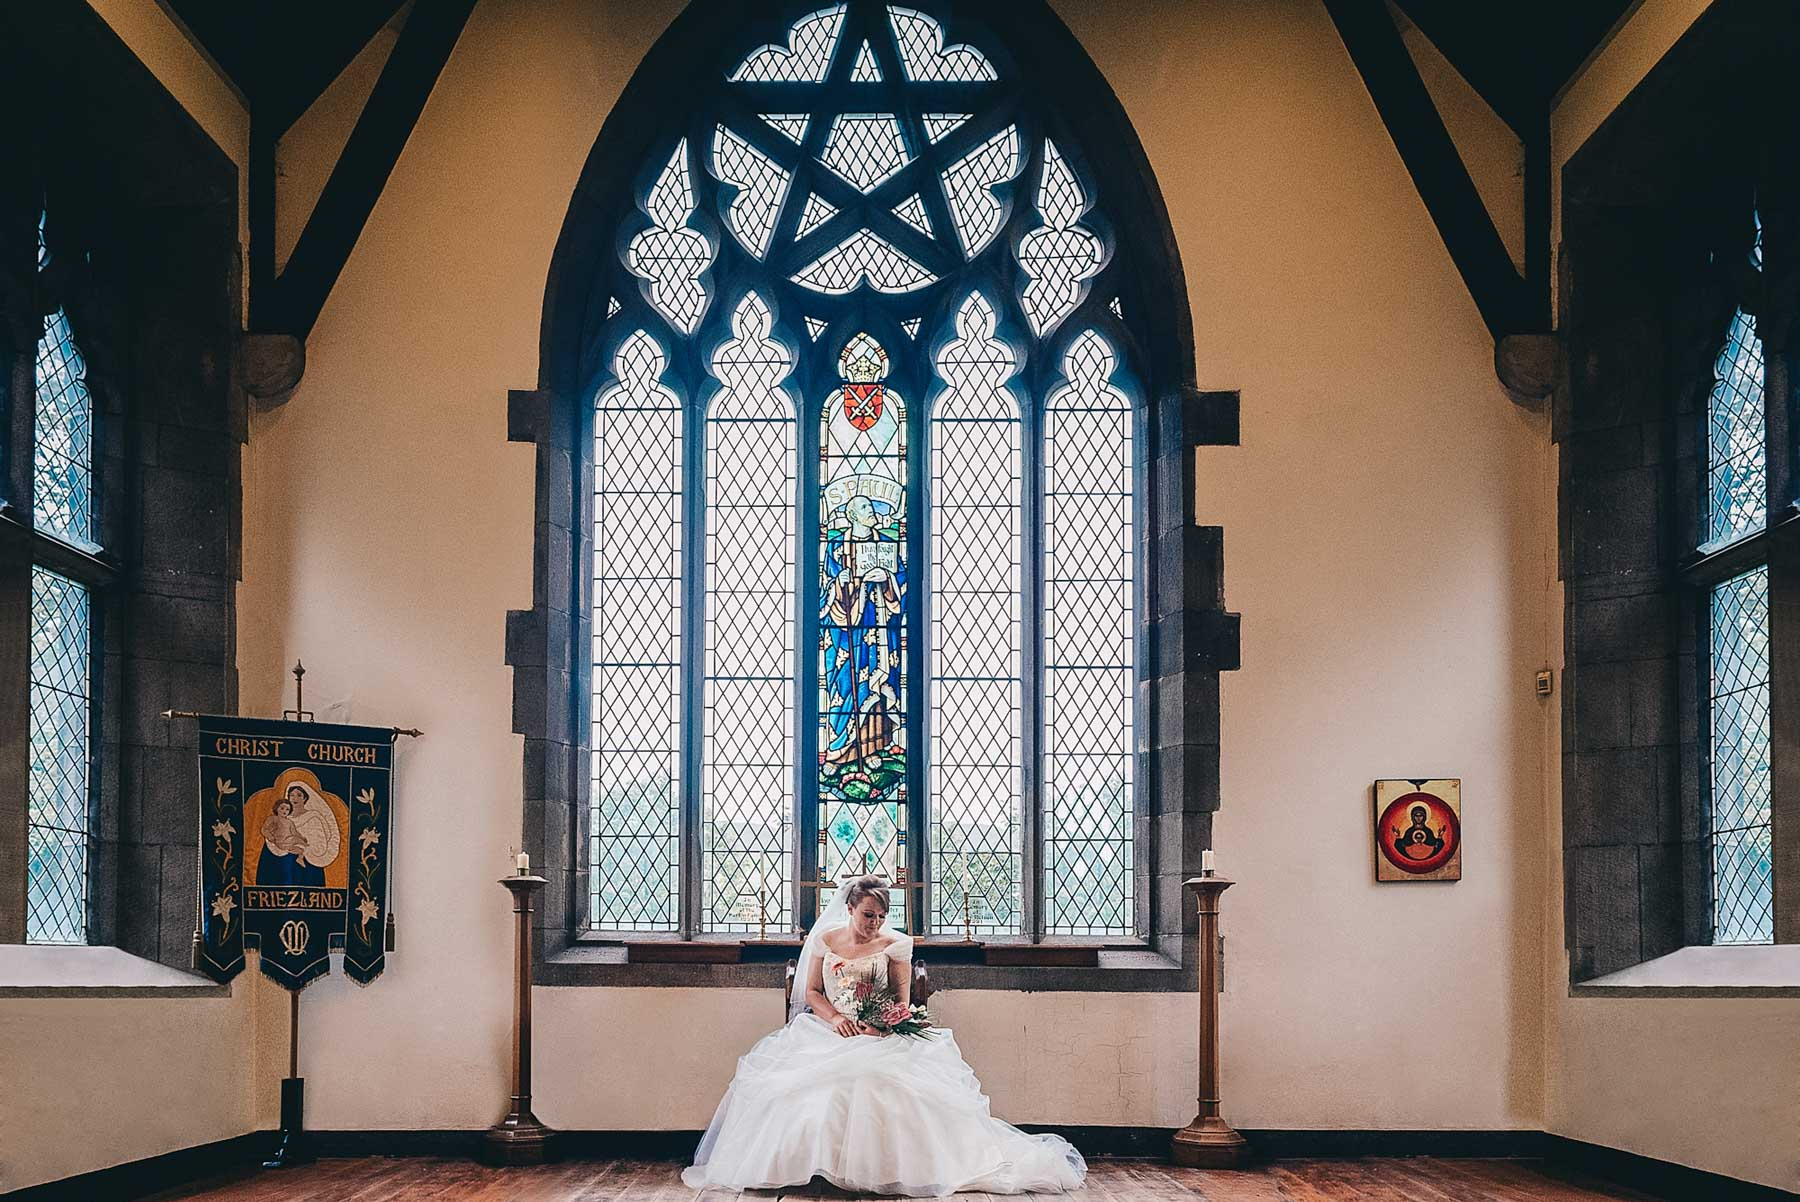 Bride looks down at flowers below grand church window